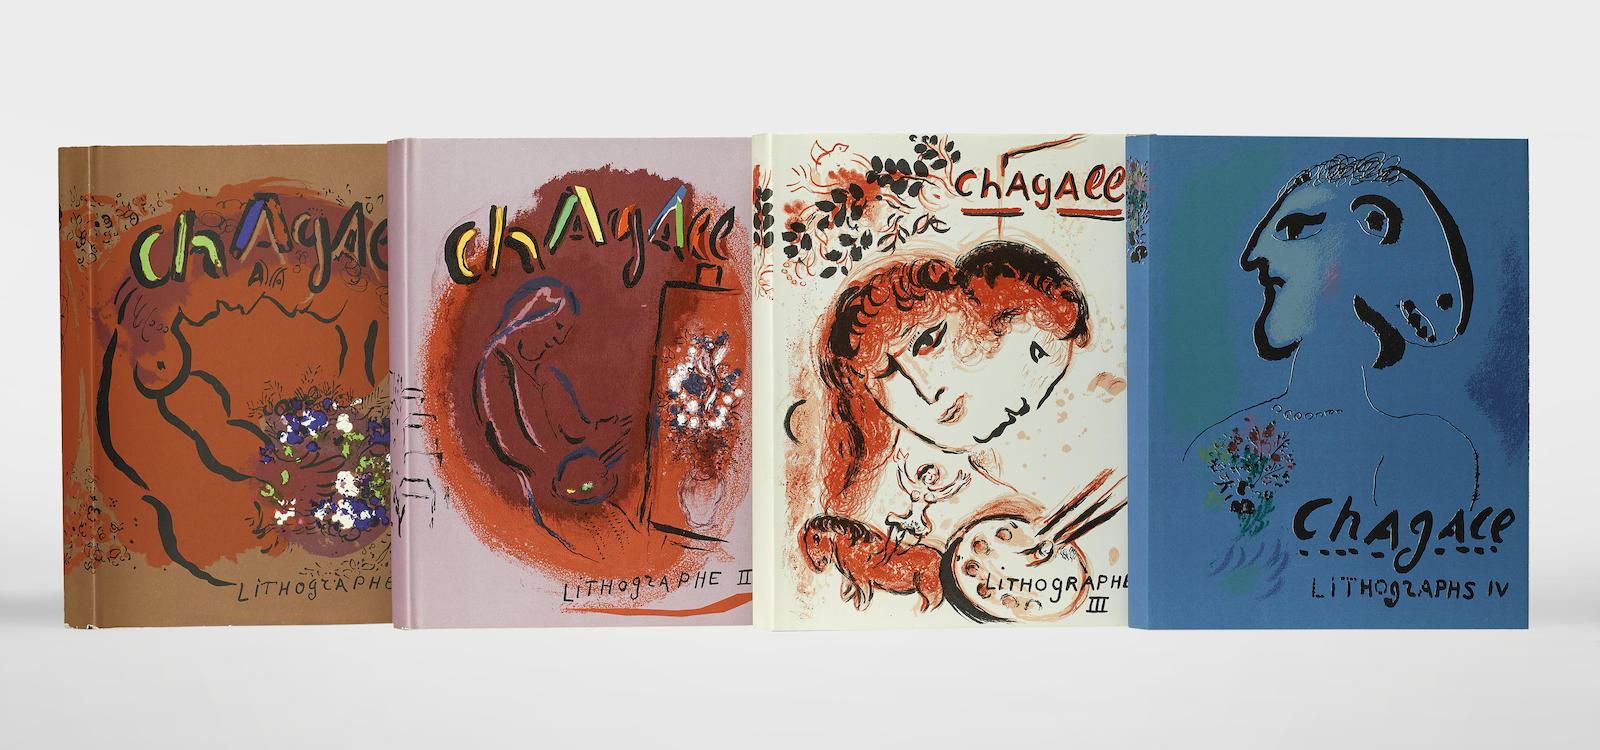 Marc Chagall-Chagall Lithographie, Vols. I-IV 4-1984